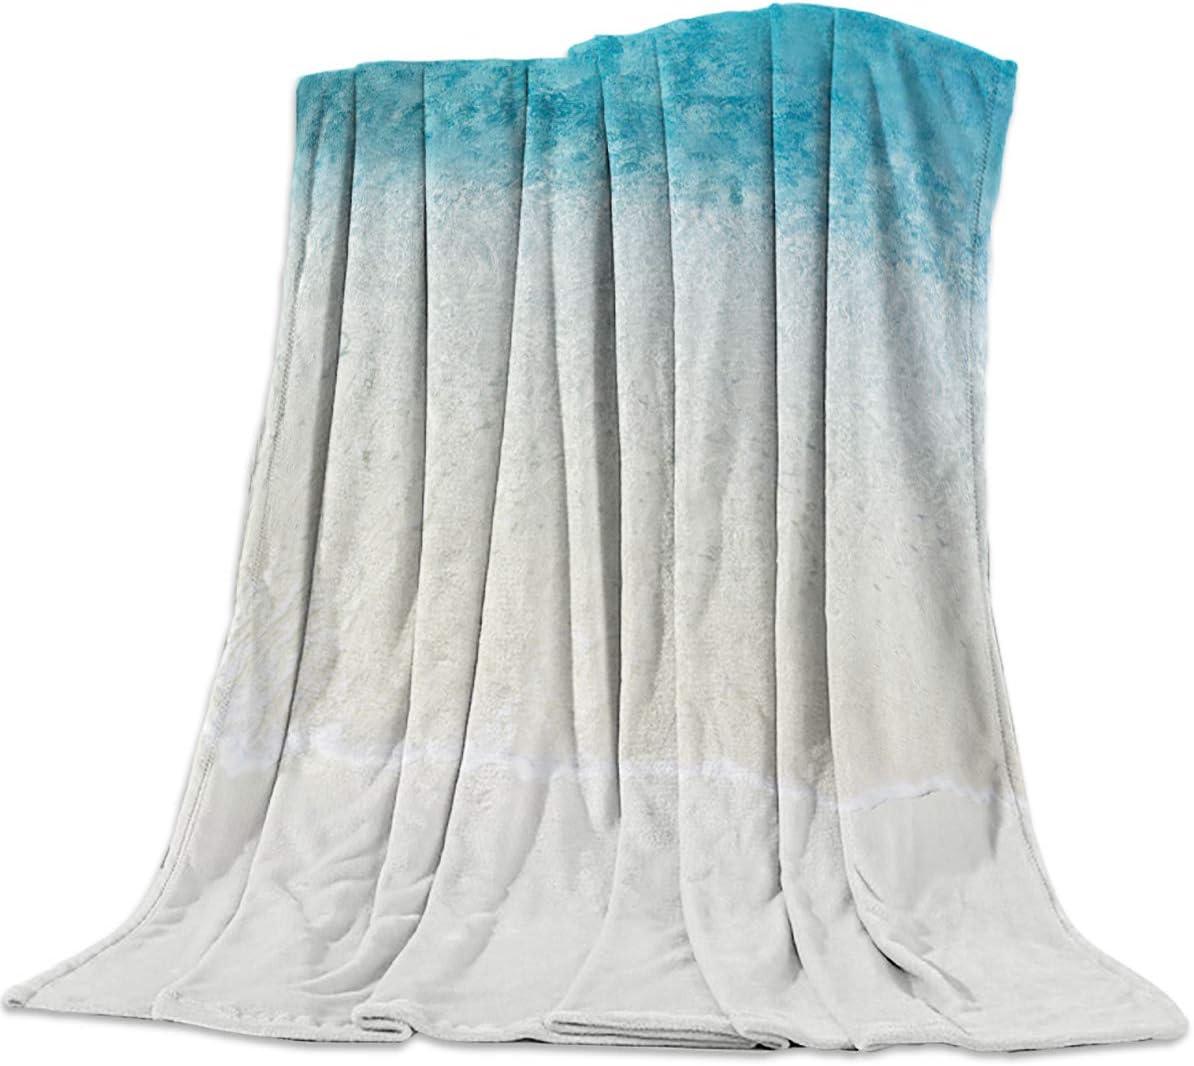 "T&H Home Flannel Fleece Bedding Blanket - 40""x50"" Hawaii Summer Holiday Ocean Island Sand Beach Anime Weighted Camp Throw Blanket for Baby Kids Boy Girls Men Women"